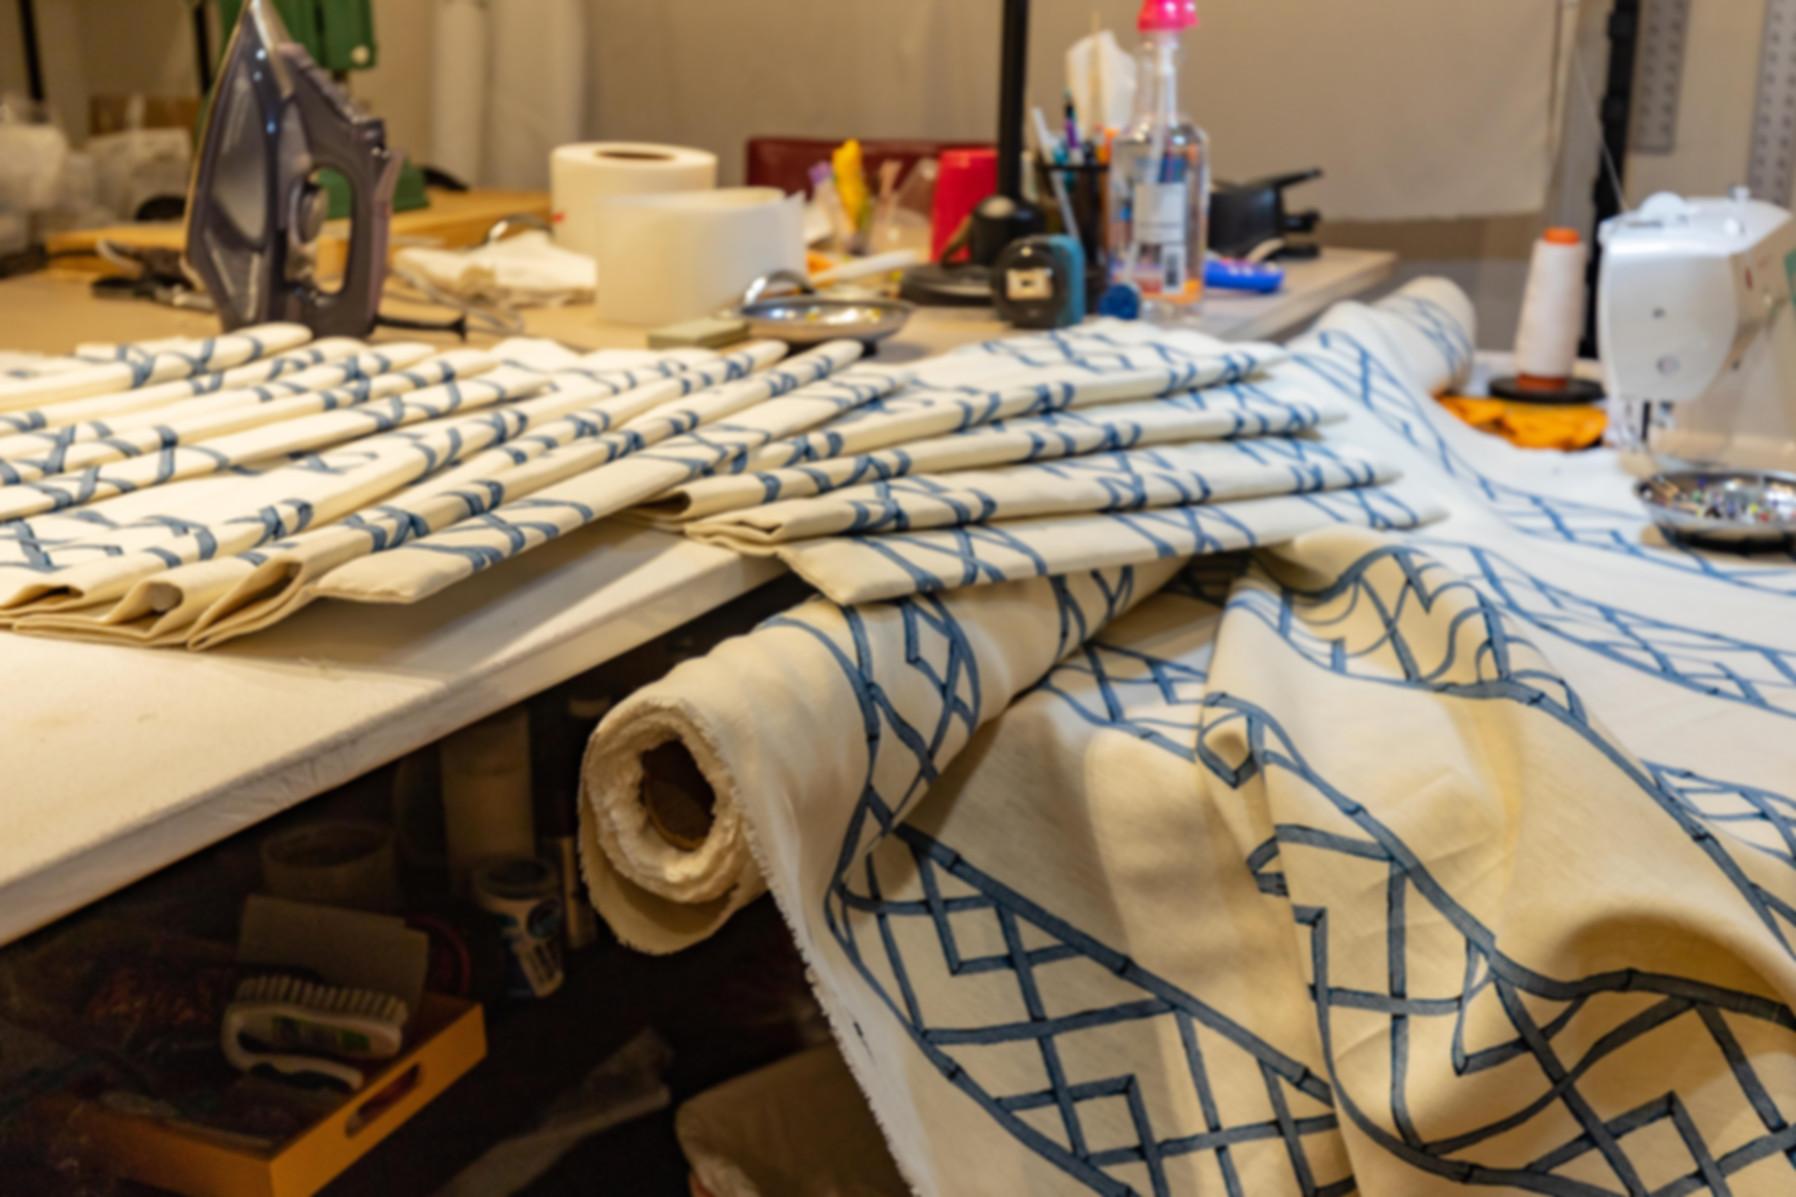 fabric sewing machine